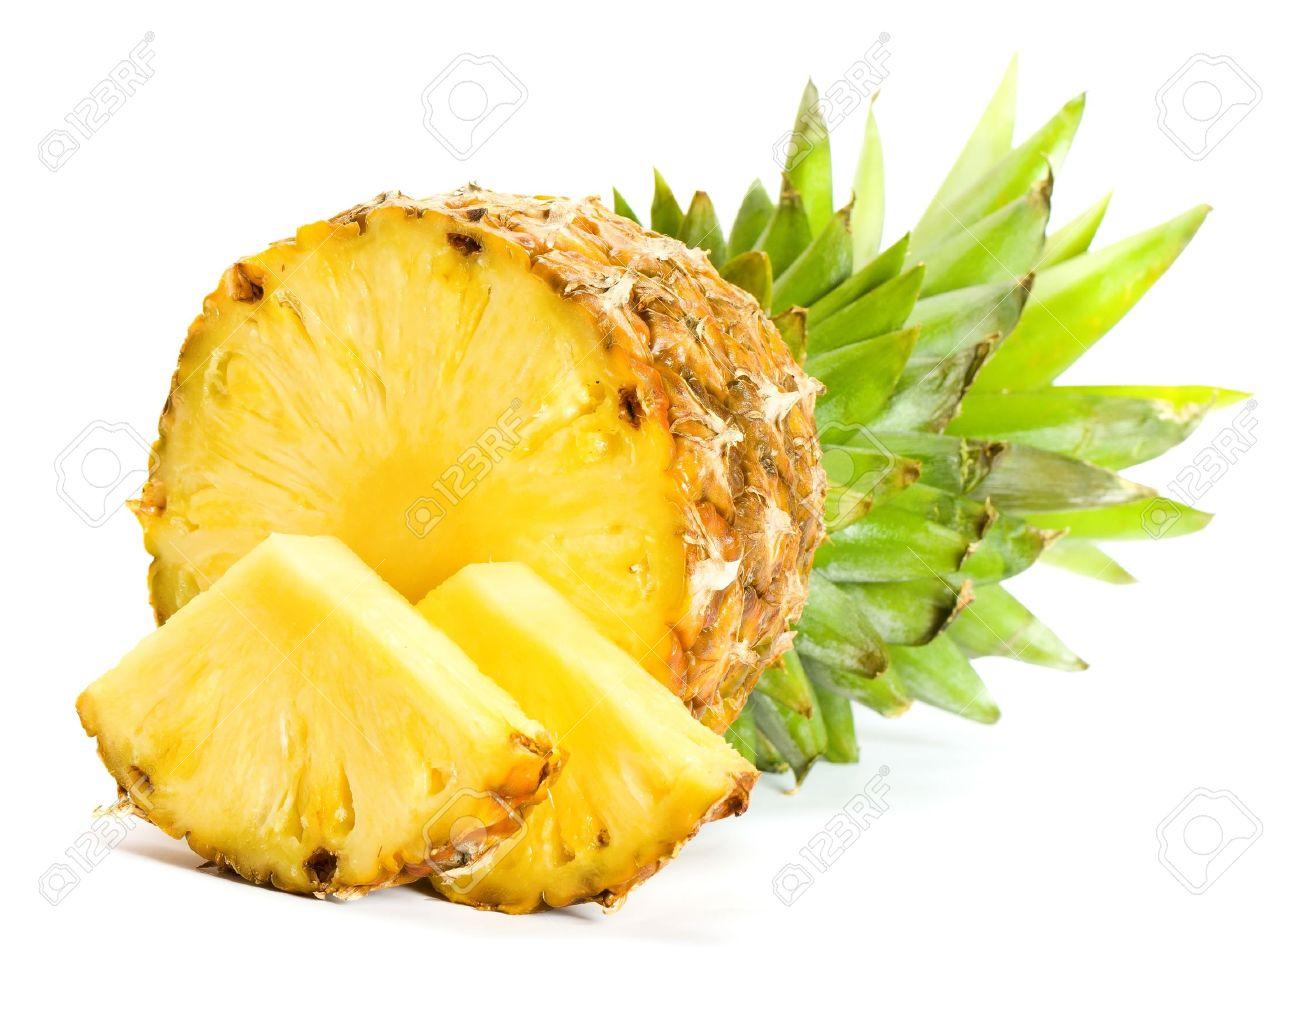 Fresh slice pineapple on white background - 8775637